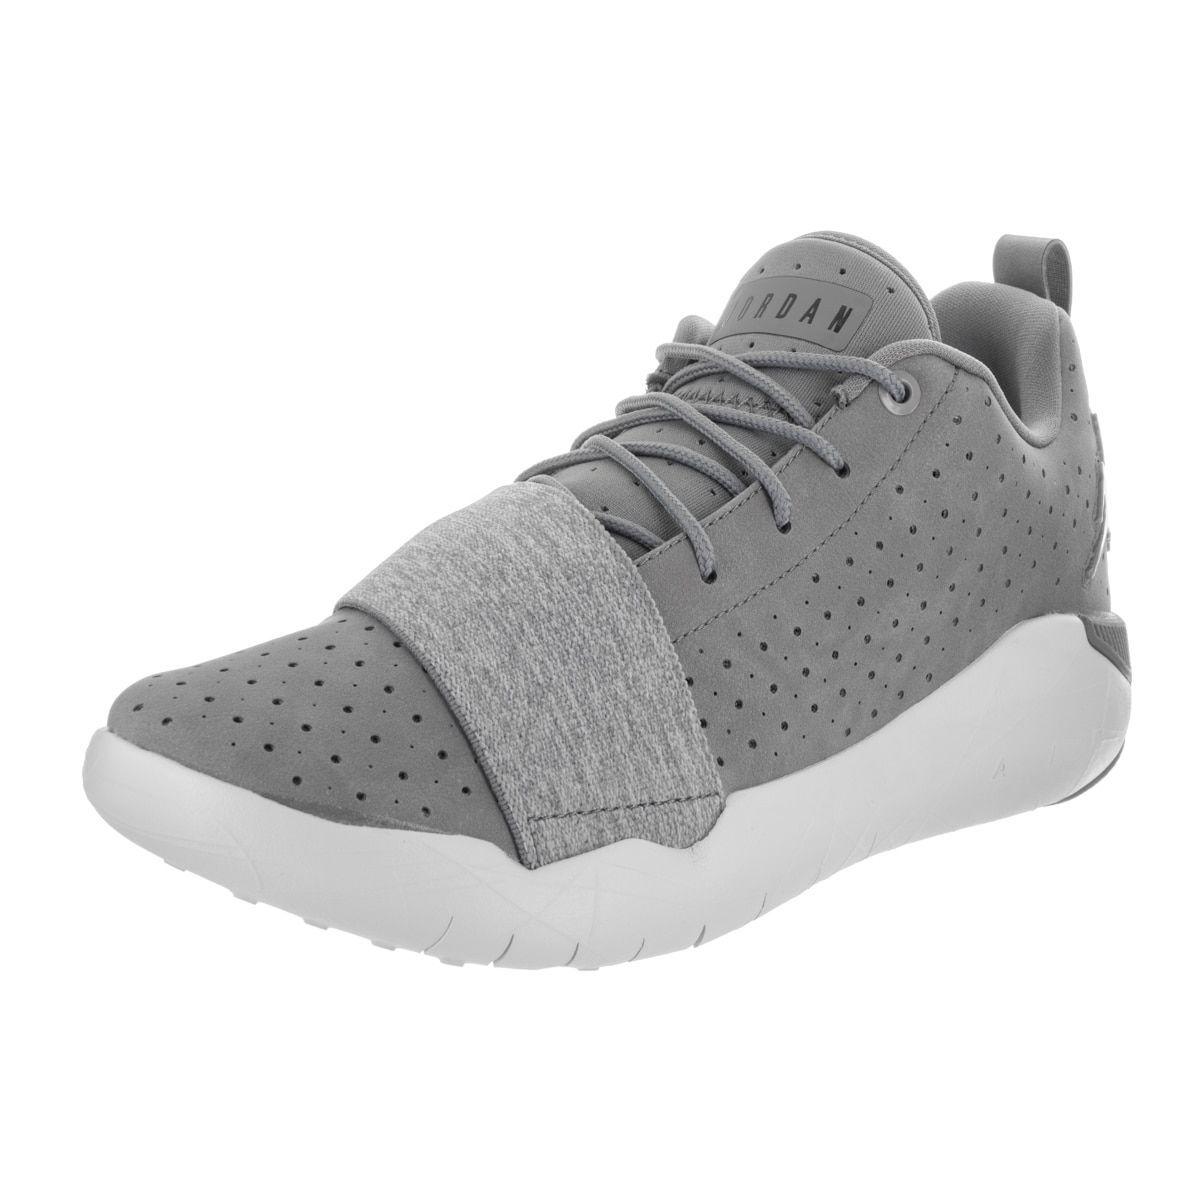 2ebf1b01db0f Basketball To Buy. Nike Jordan Men s Jordan 23 Breakout Basketball Shoe